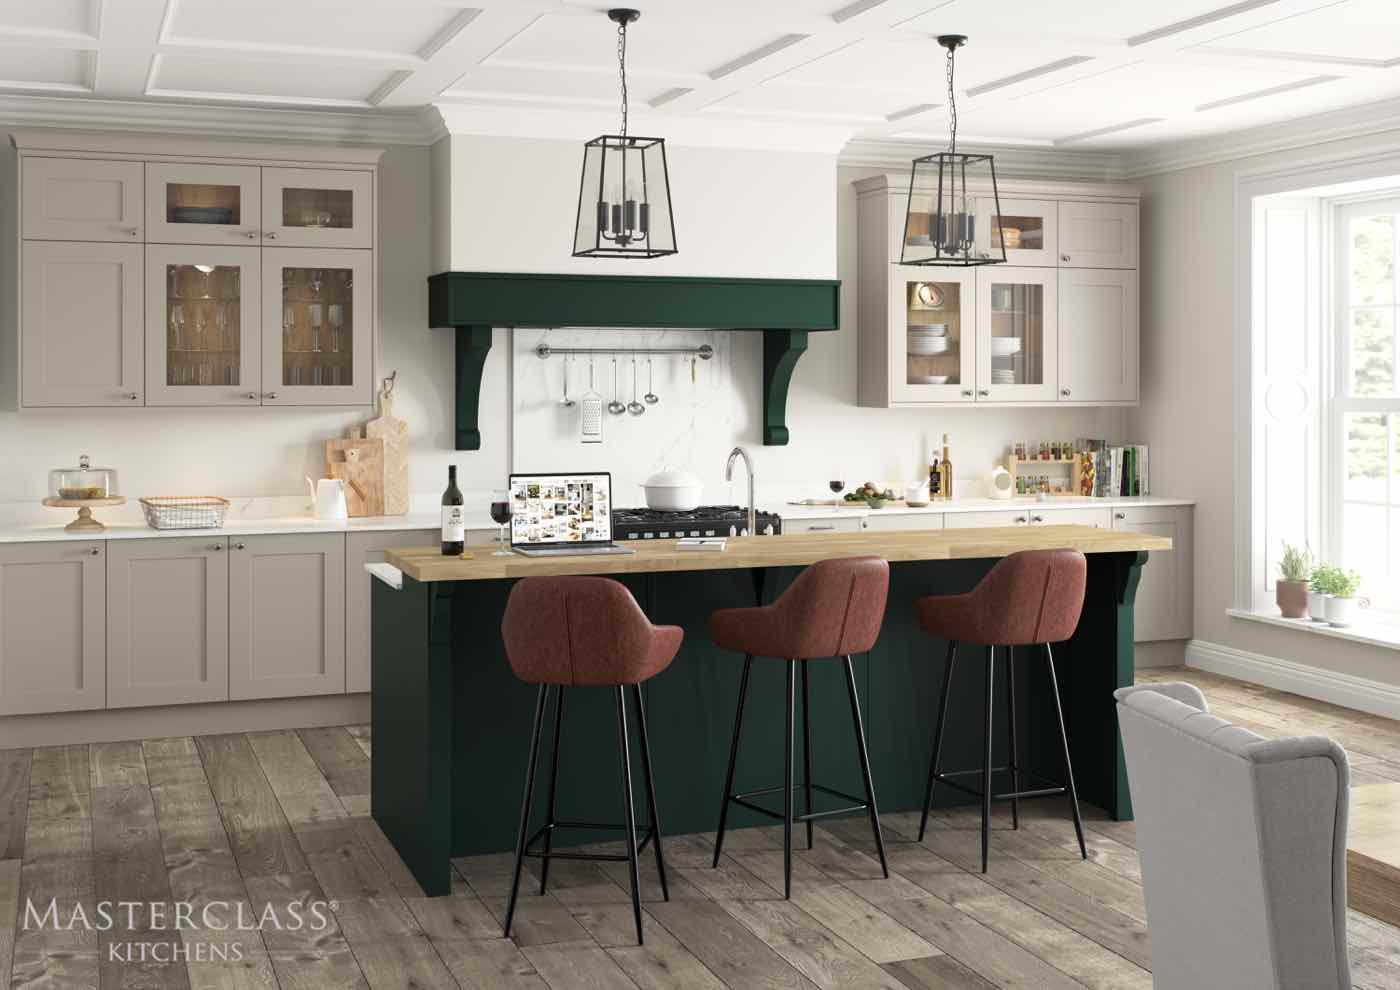 masterclass Marlborough kitchens